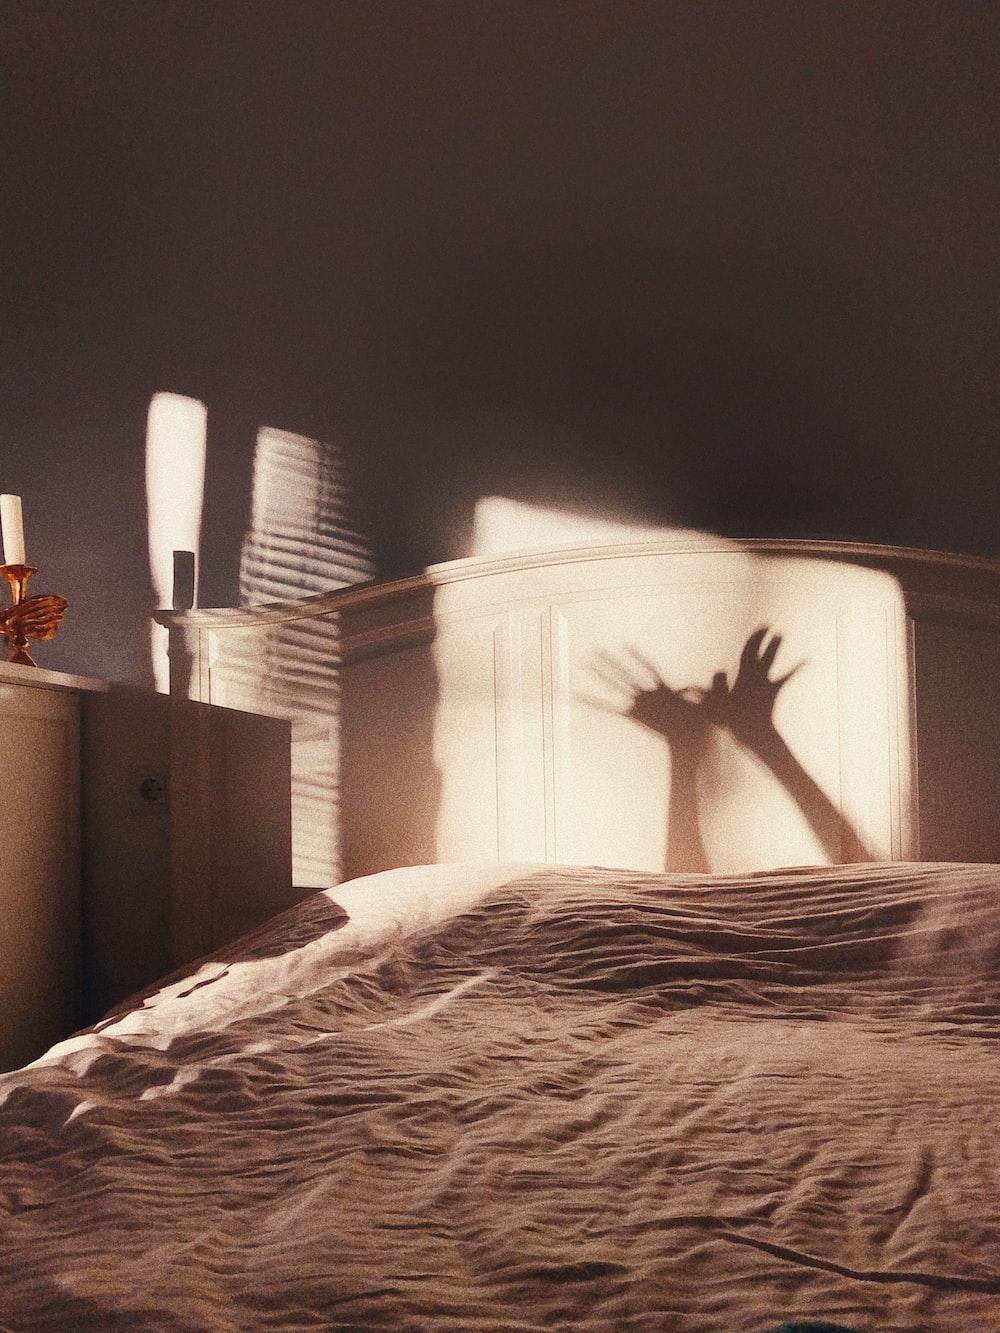 white bed linen near brown wooden drawer